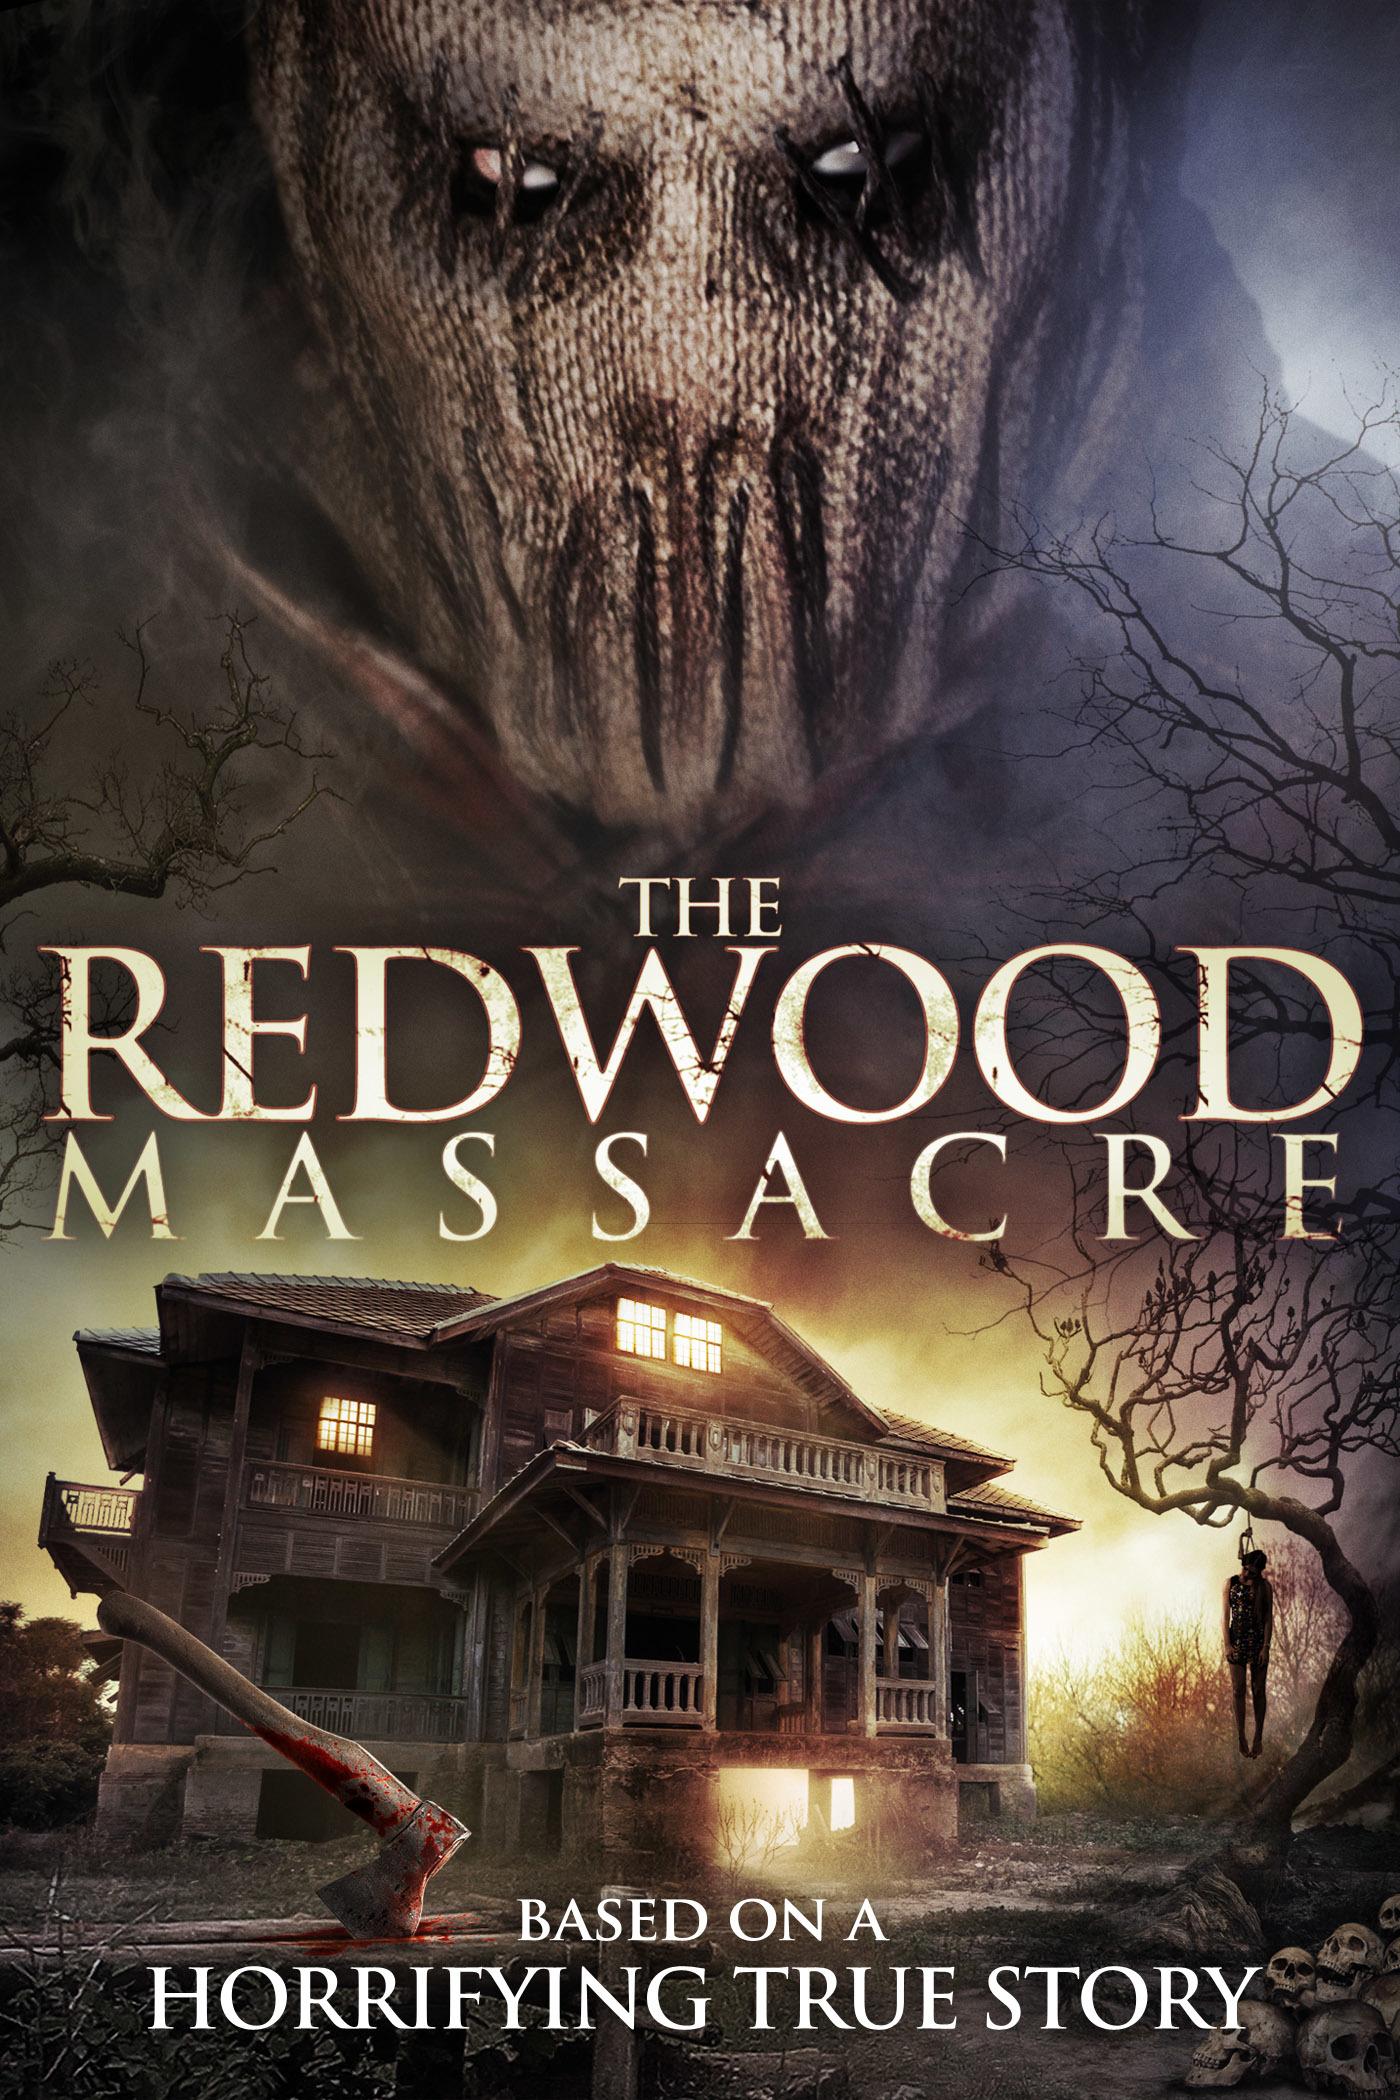 RedwoodMassacre_KeyArt_1400x2100.jpg?1565018637